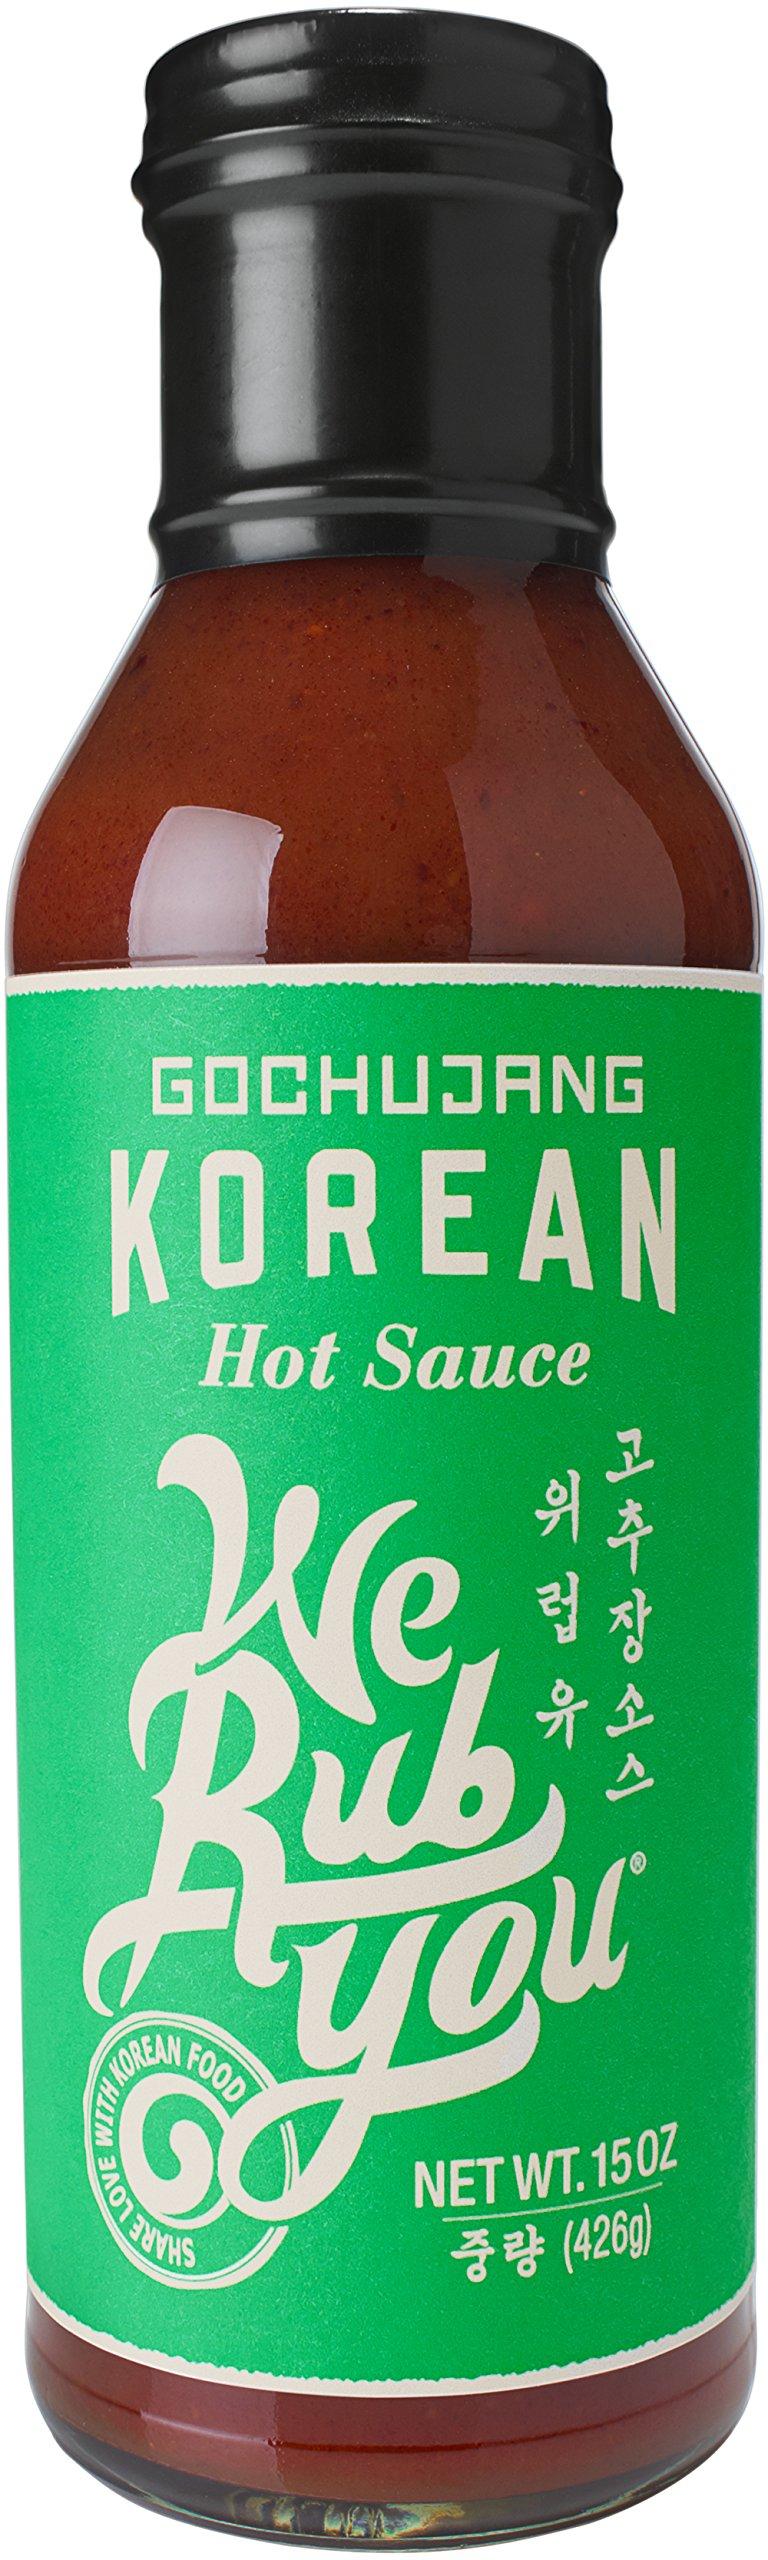 Gochujang Korean Hot Sauce We Rub You 15 oz (Pack of 1)